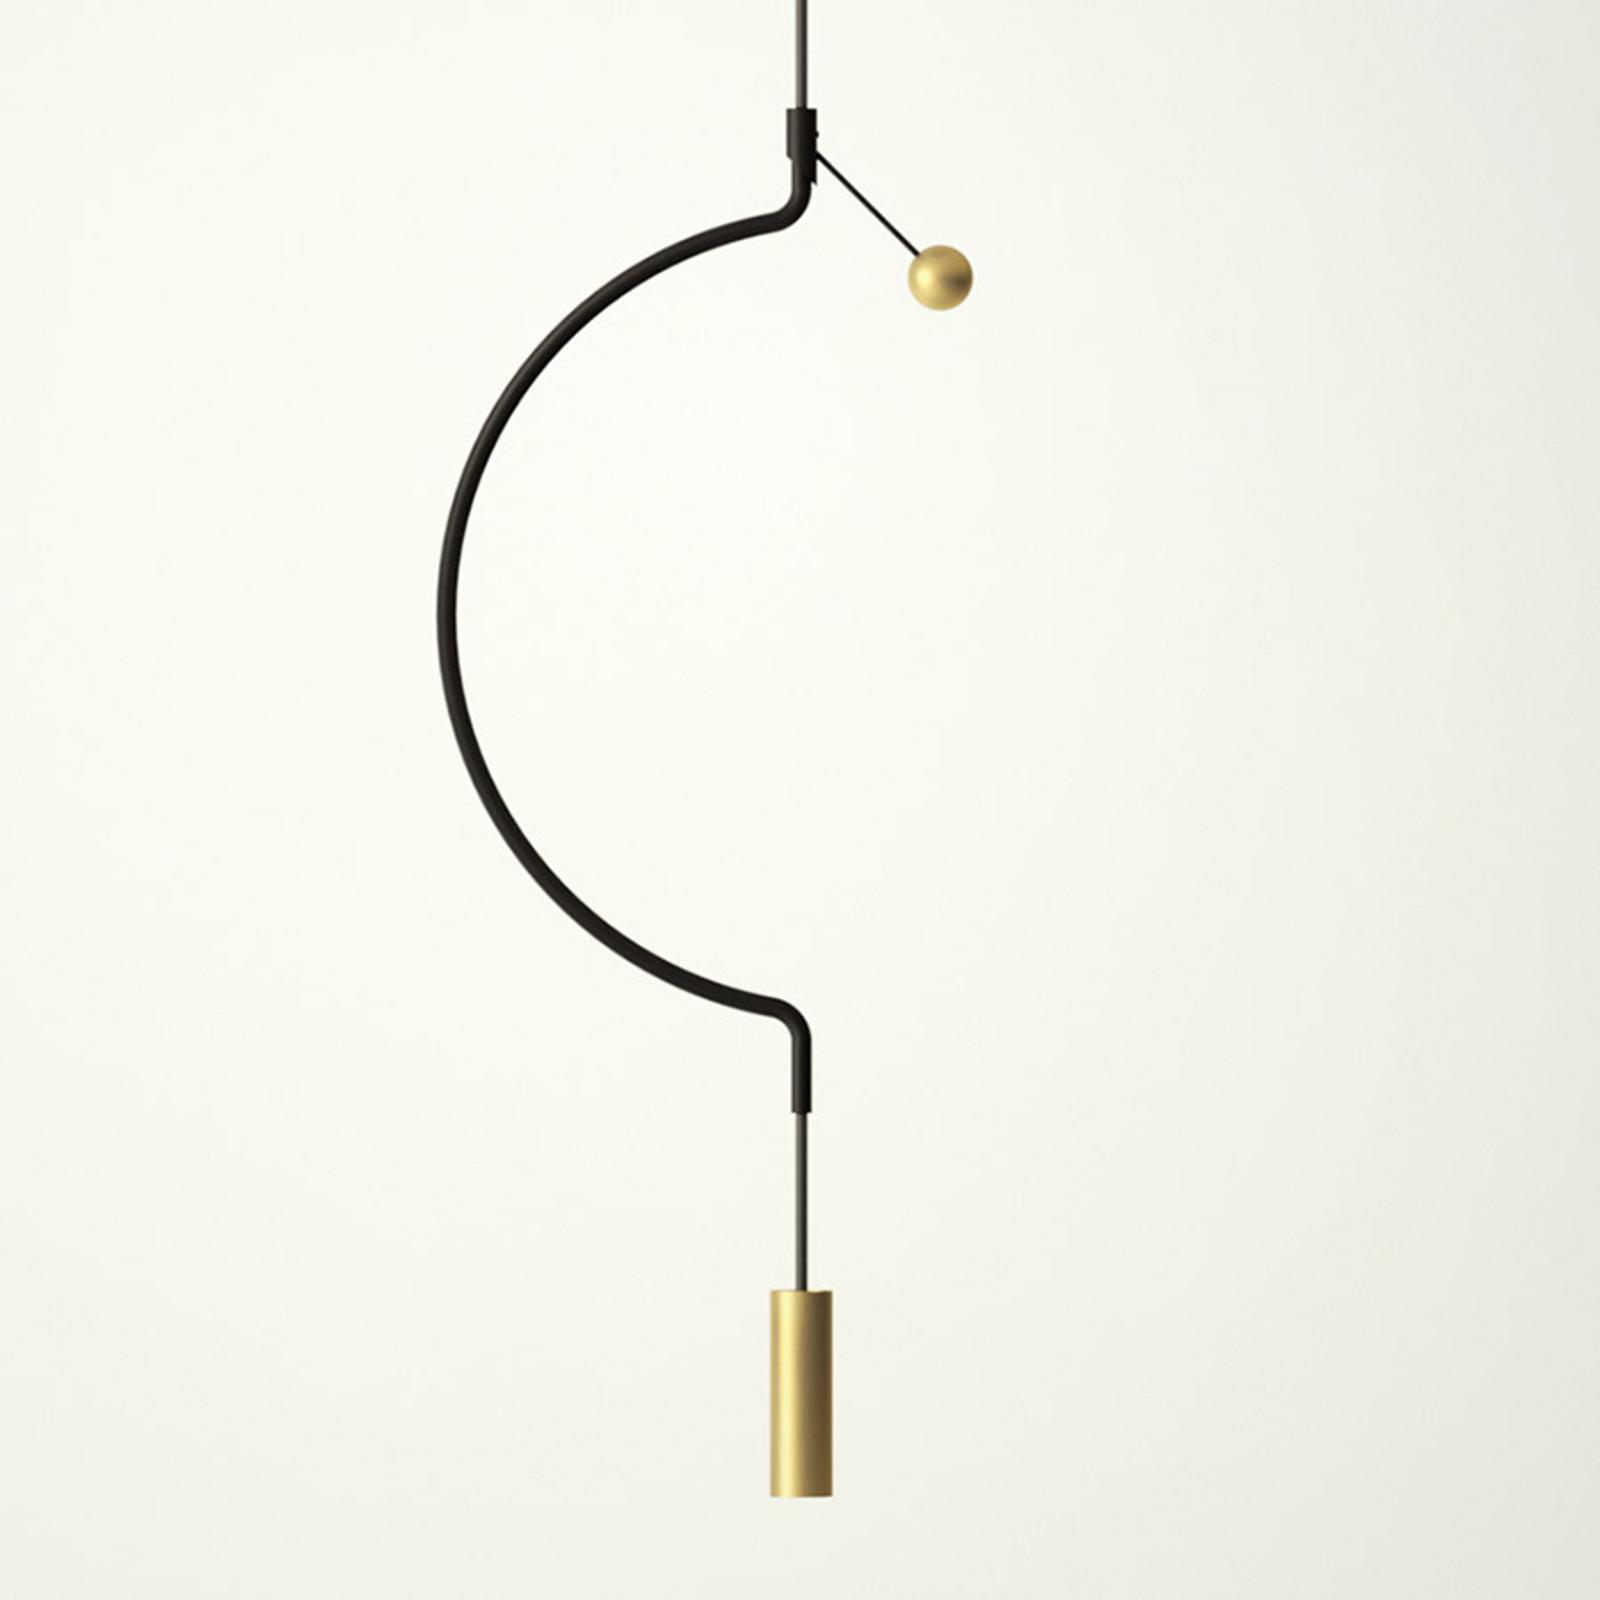 Axolight Liaison P1 Pendellampe schwarz/gold 32cm